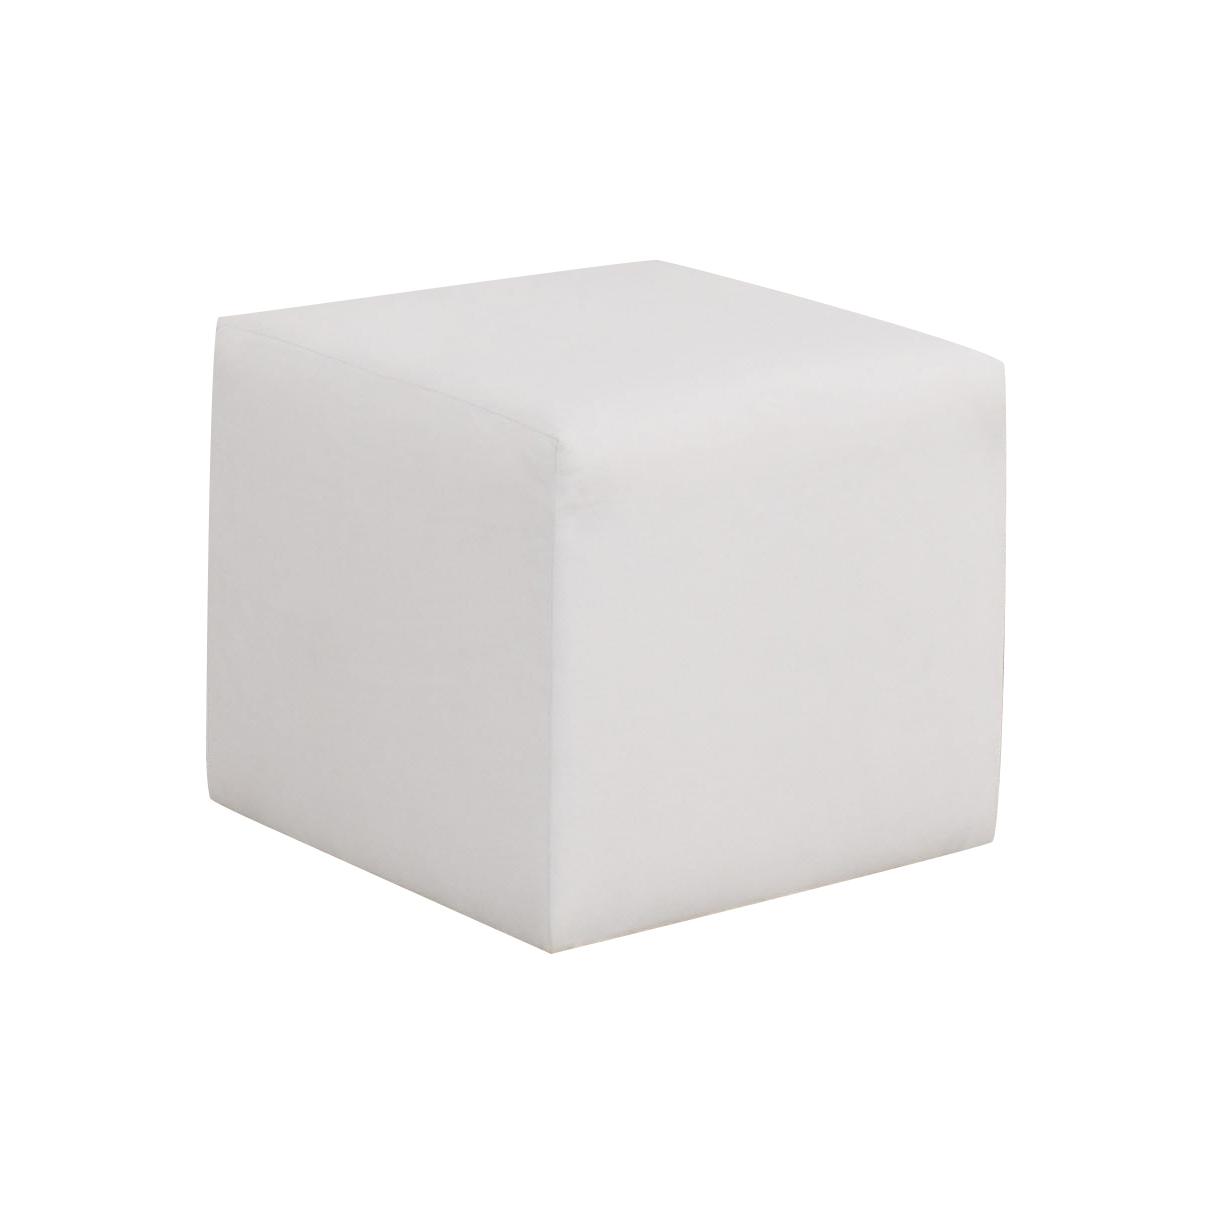 The Inside The Inside Cube Ottoman